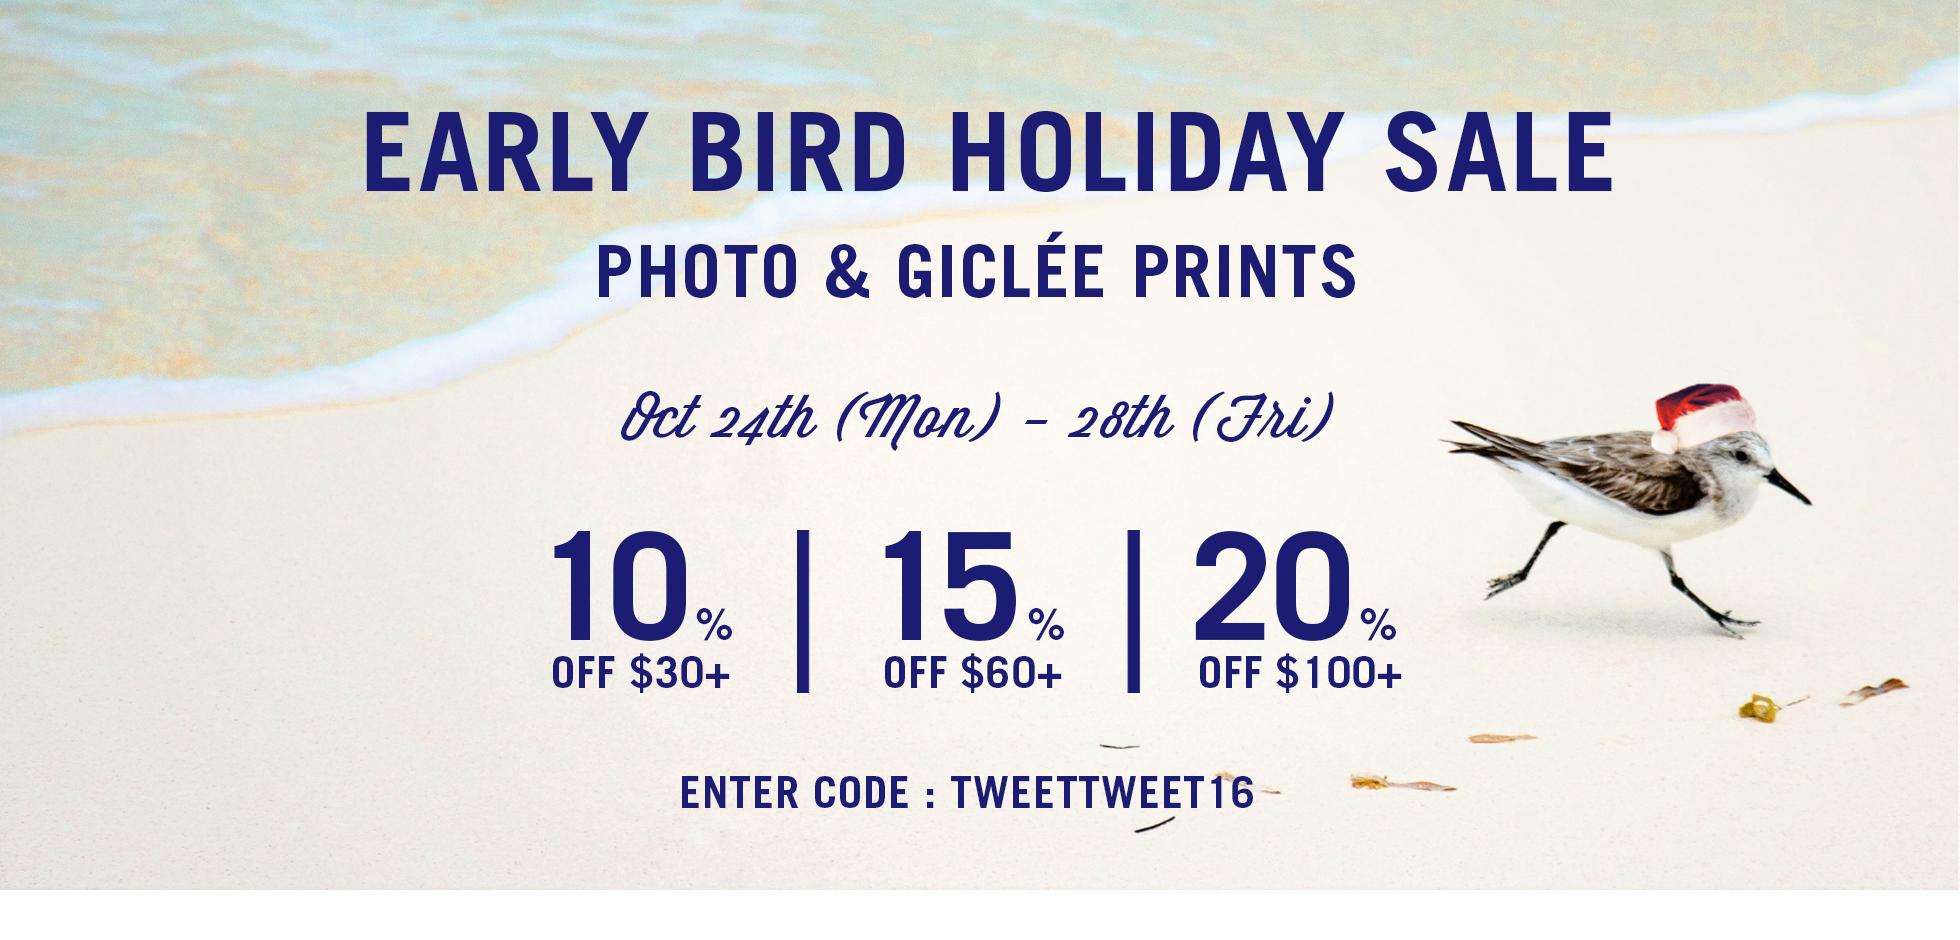 Early Bird Holiday Sale